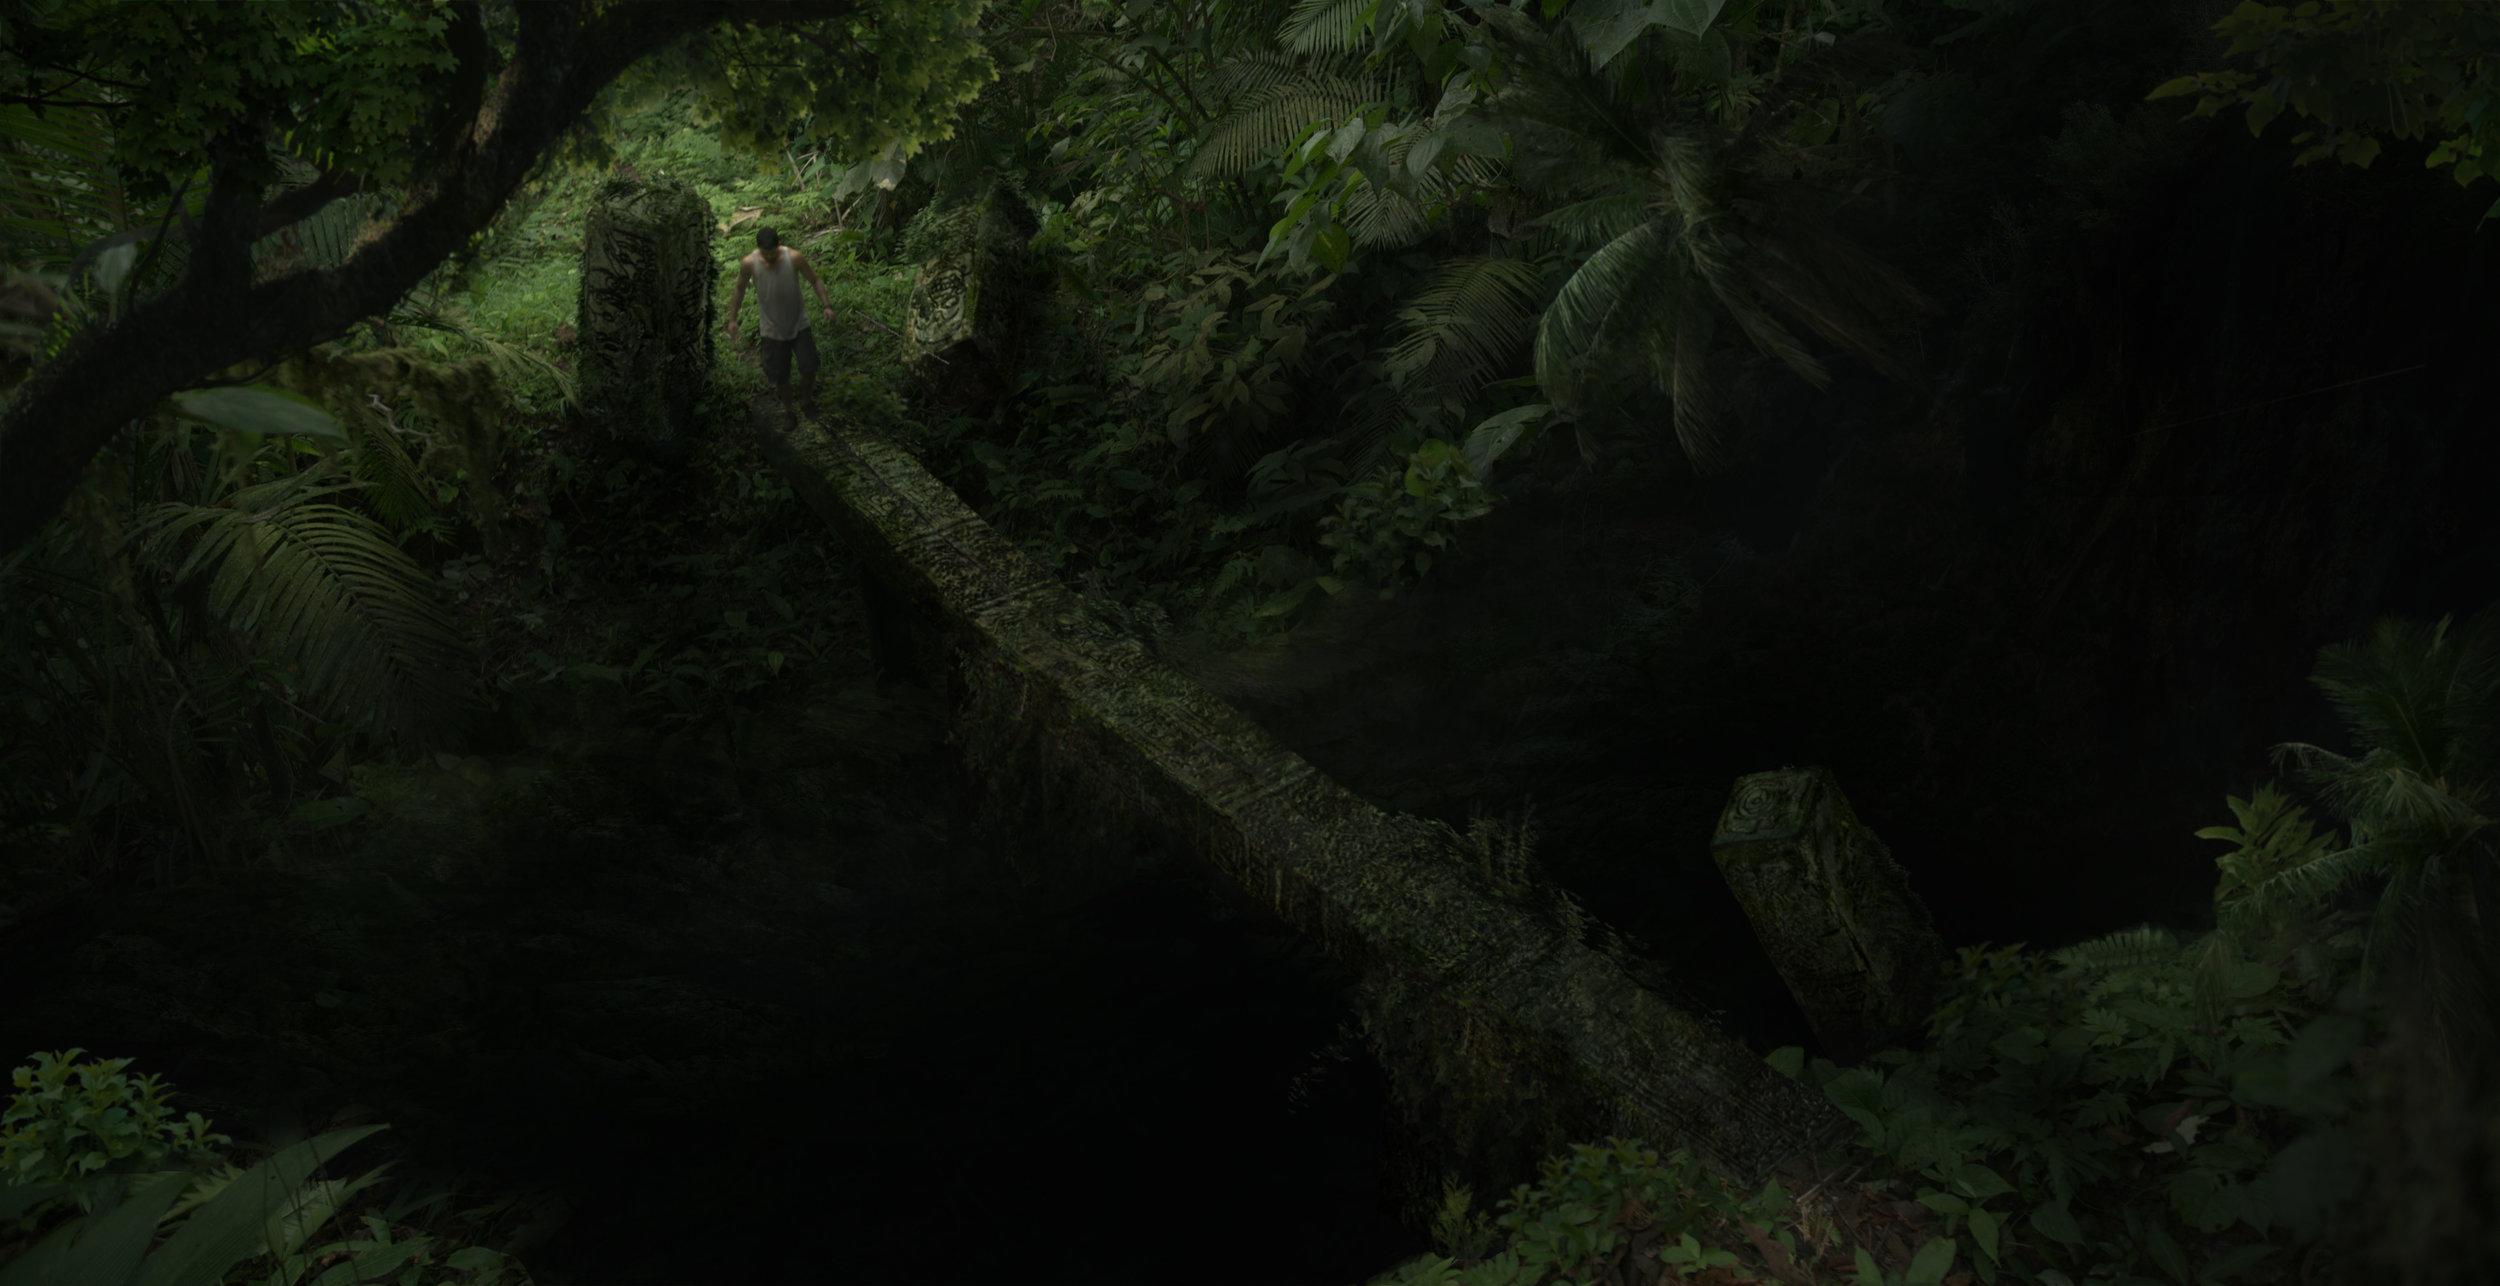 Extructura en selva Mateo5croppedforwork_cropped.jpg